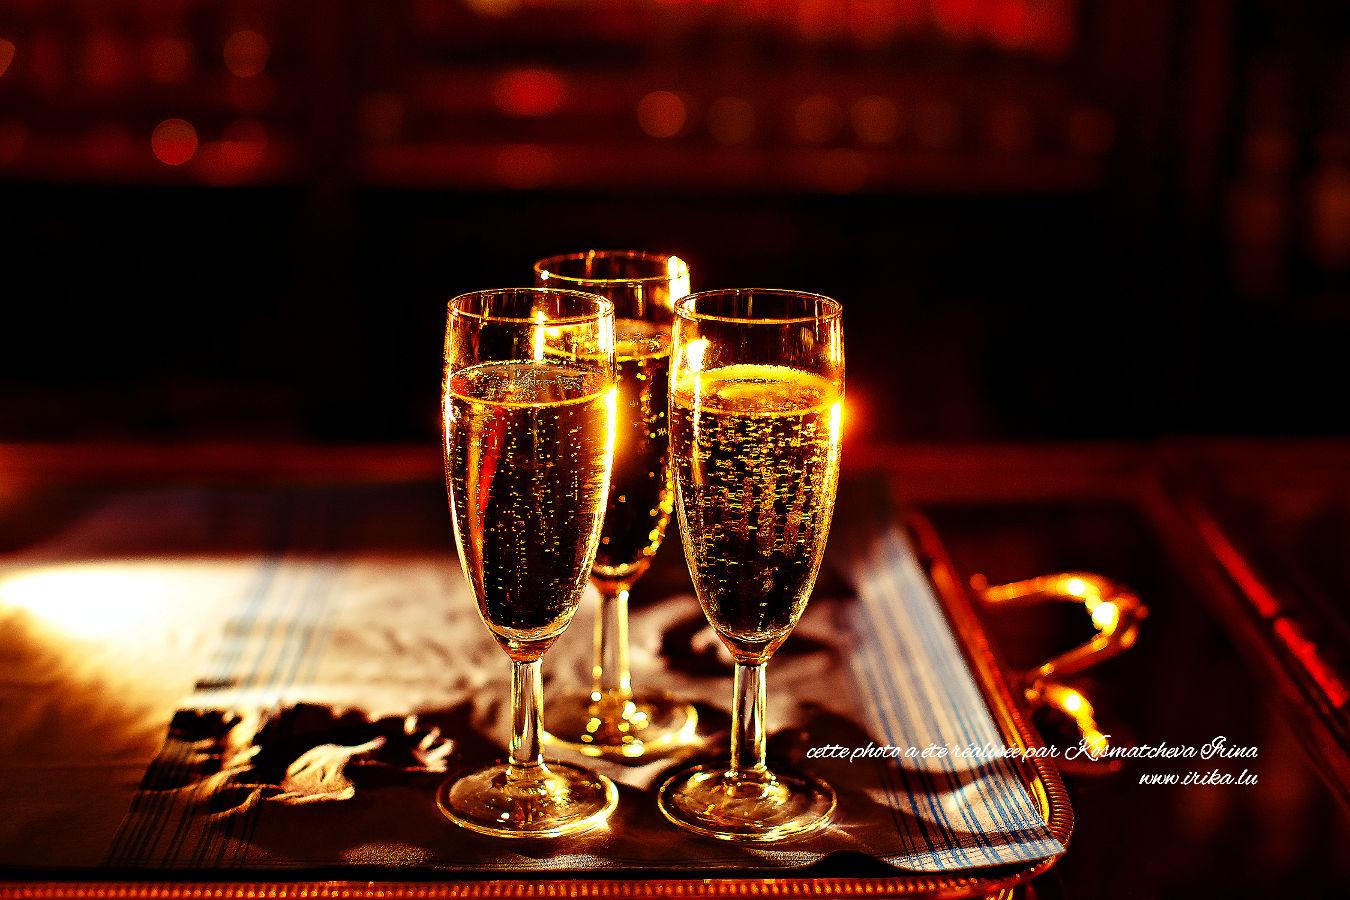 Trois verres d'or